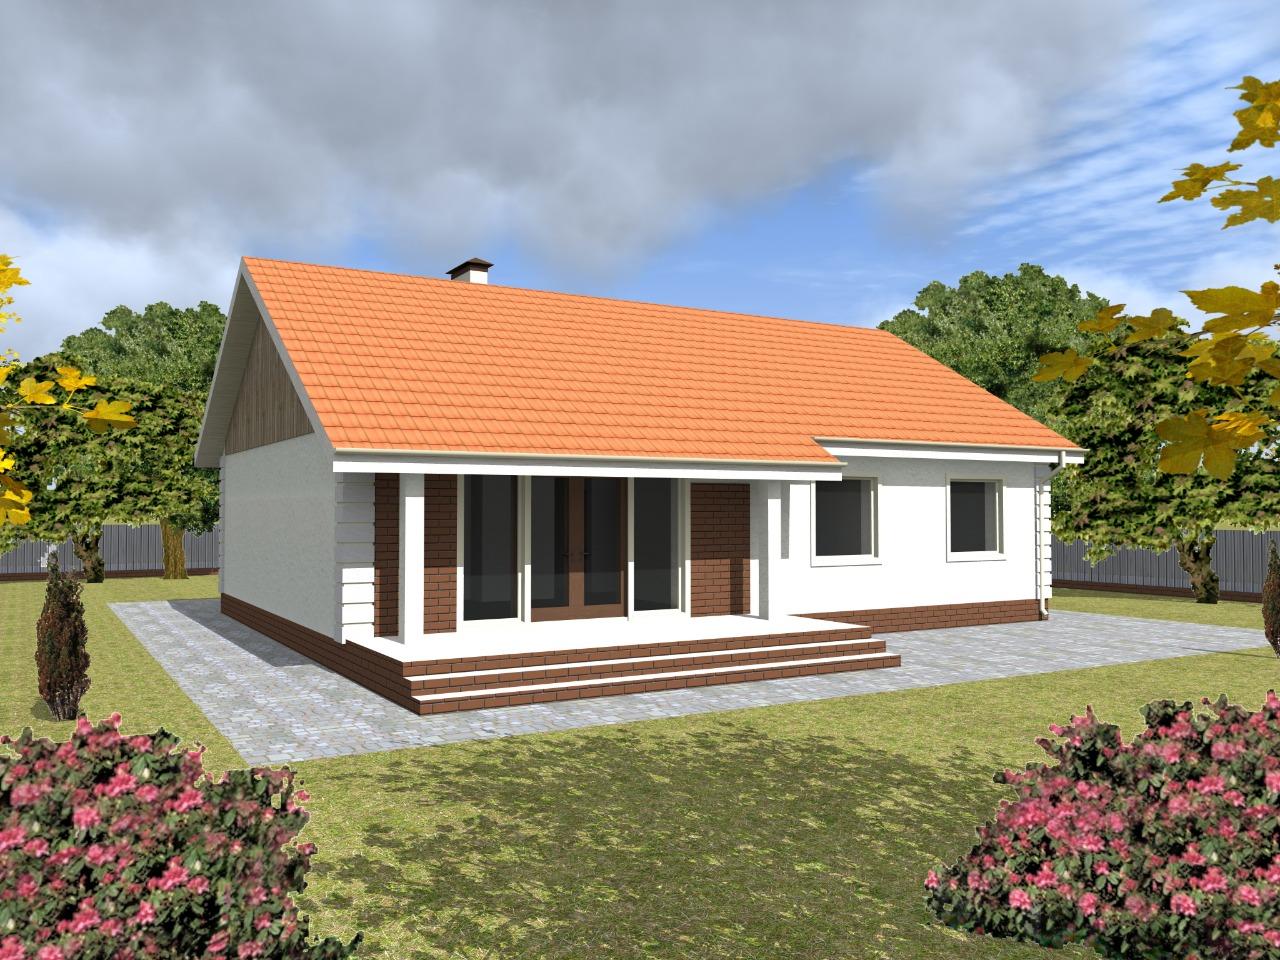 Проект одноэтажного дома из газобетона 120 м2